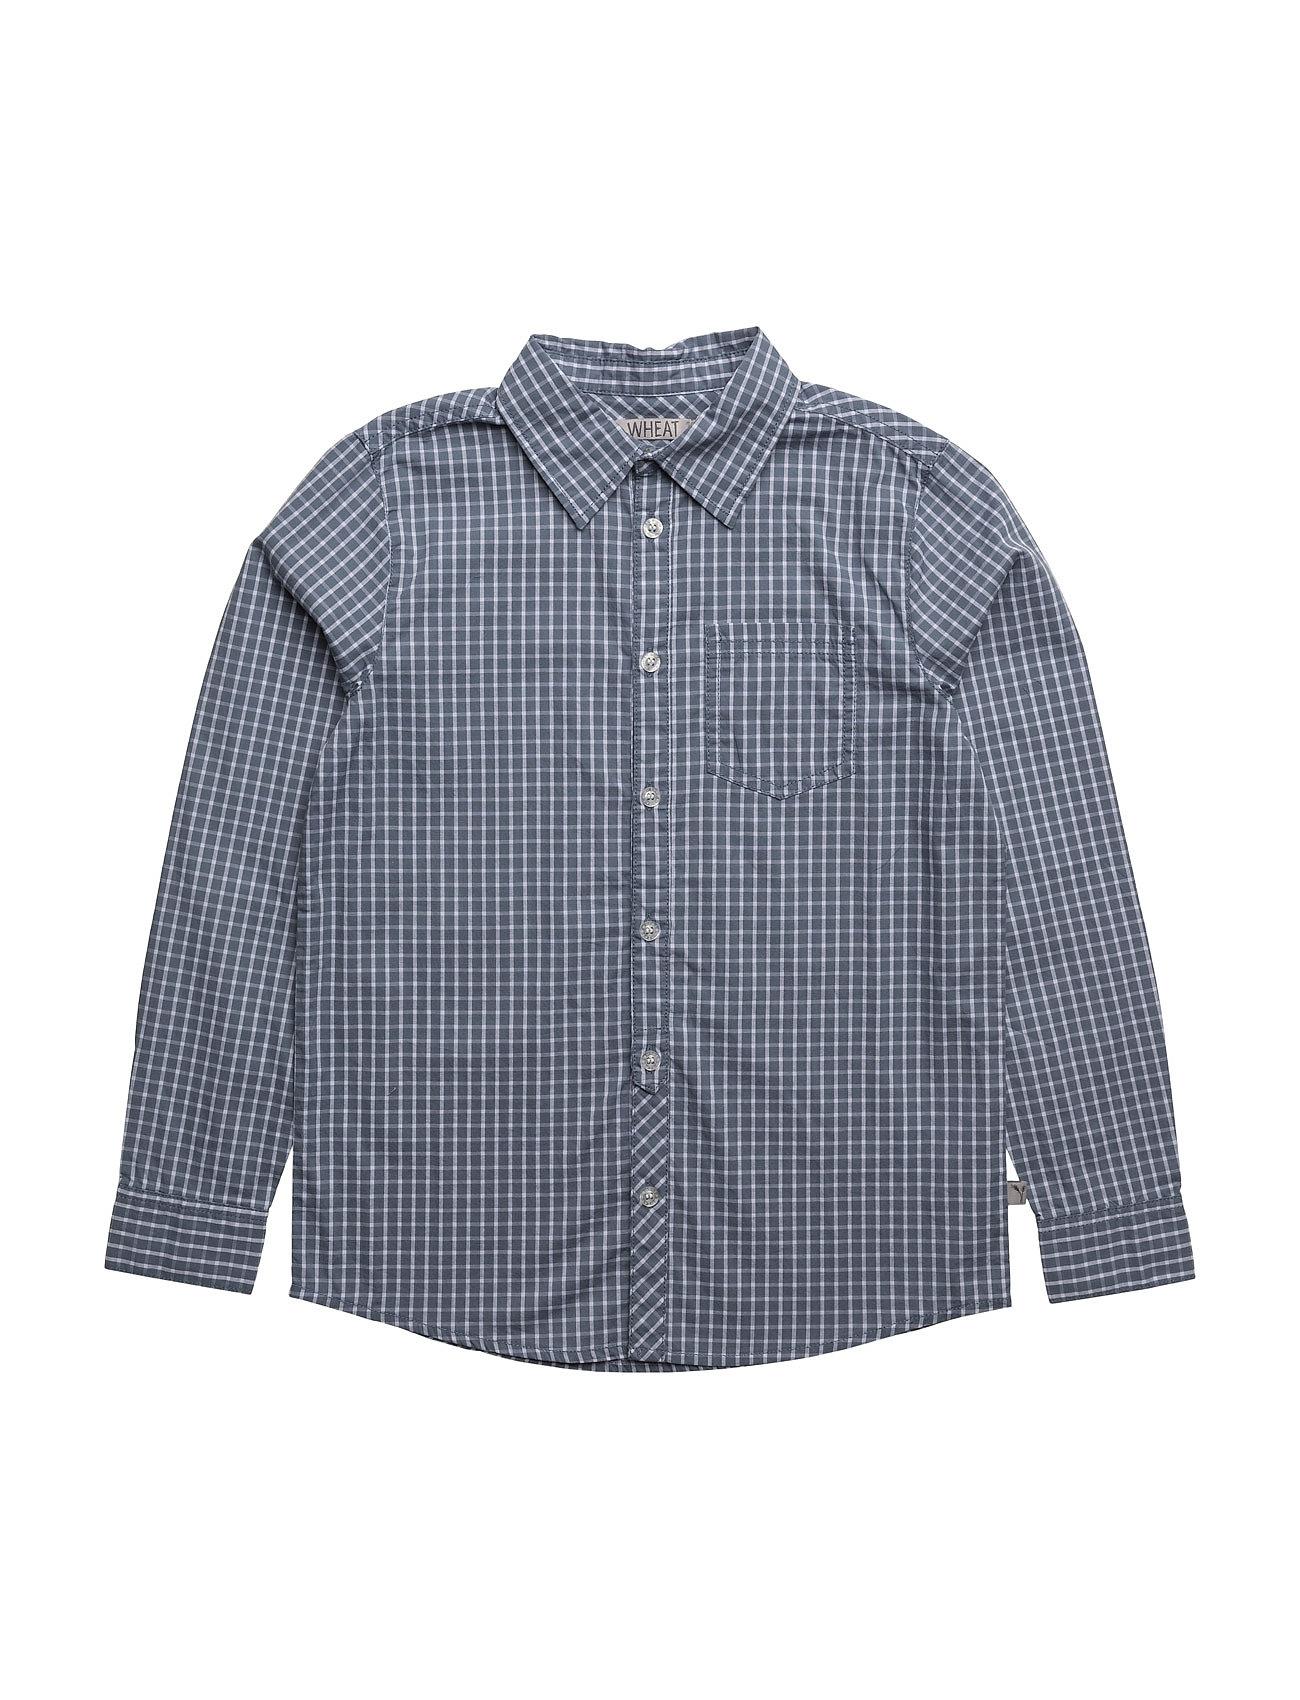 wheat – Shirt olof ls på boozt.com dk